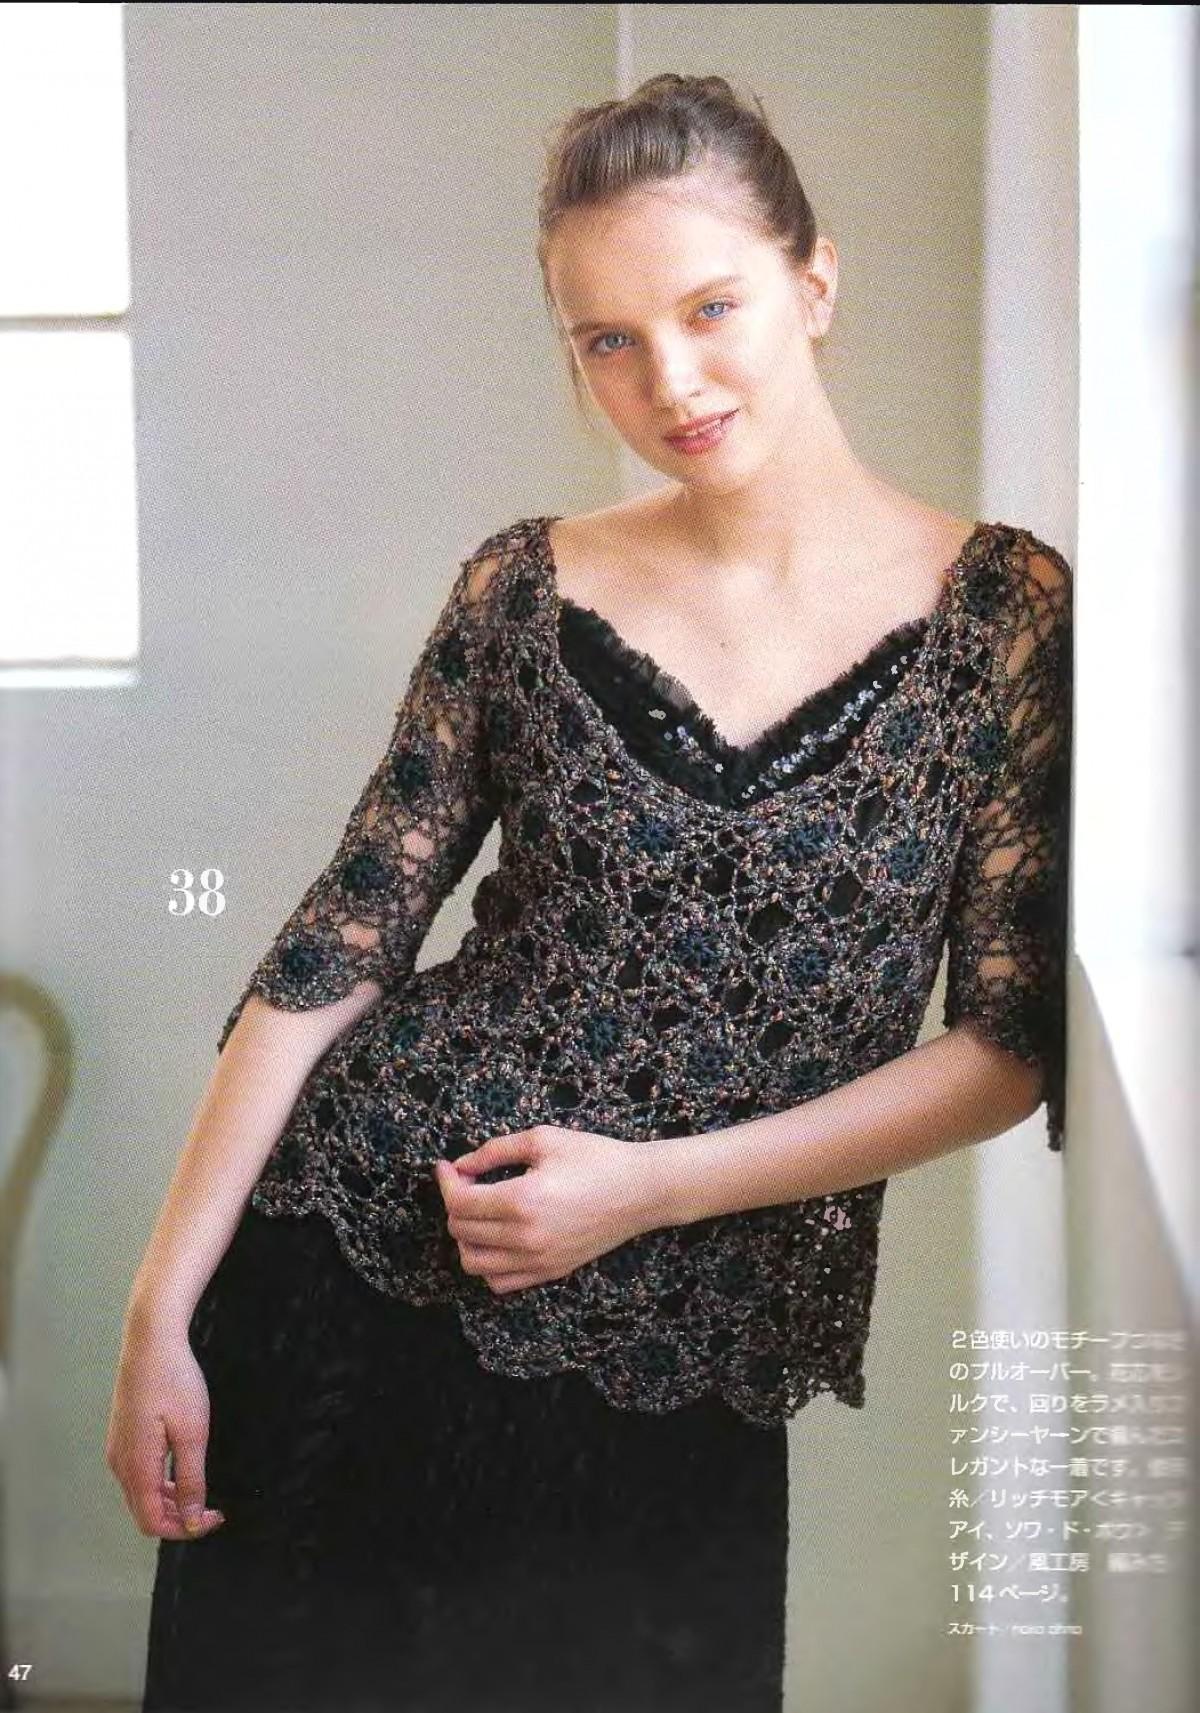 Lets-knit-series-NV4359-2008-Spring-Summer-sp-kr_45.jpg